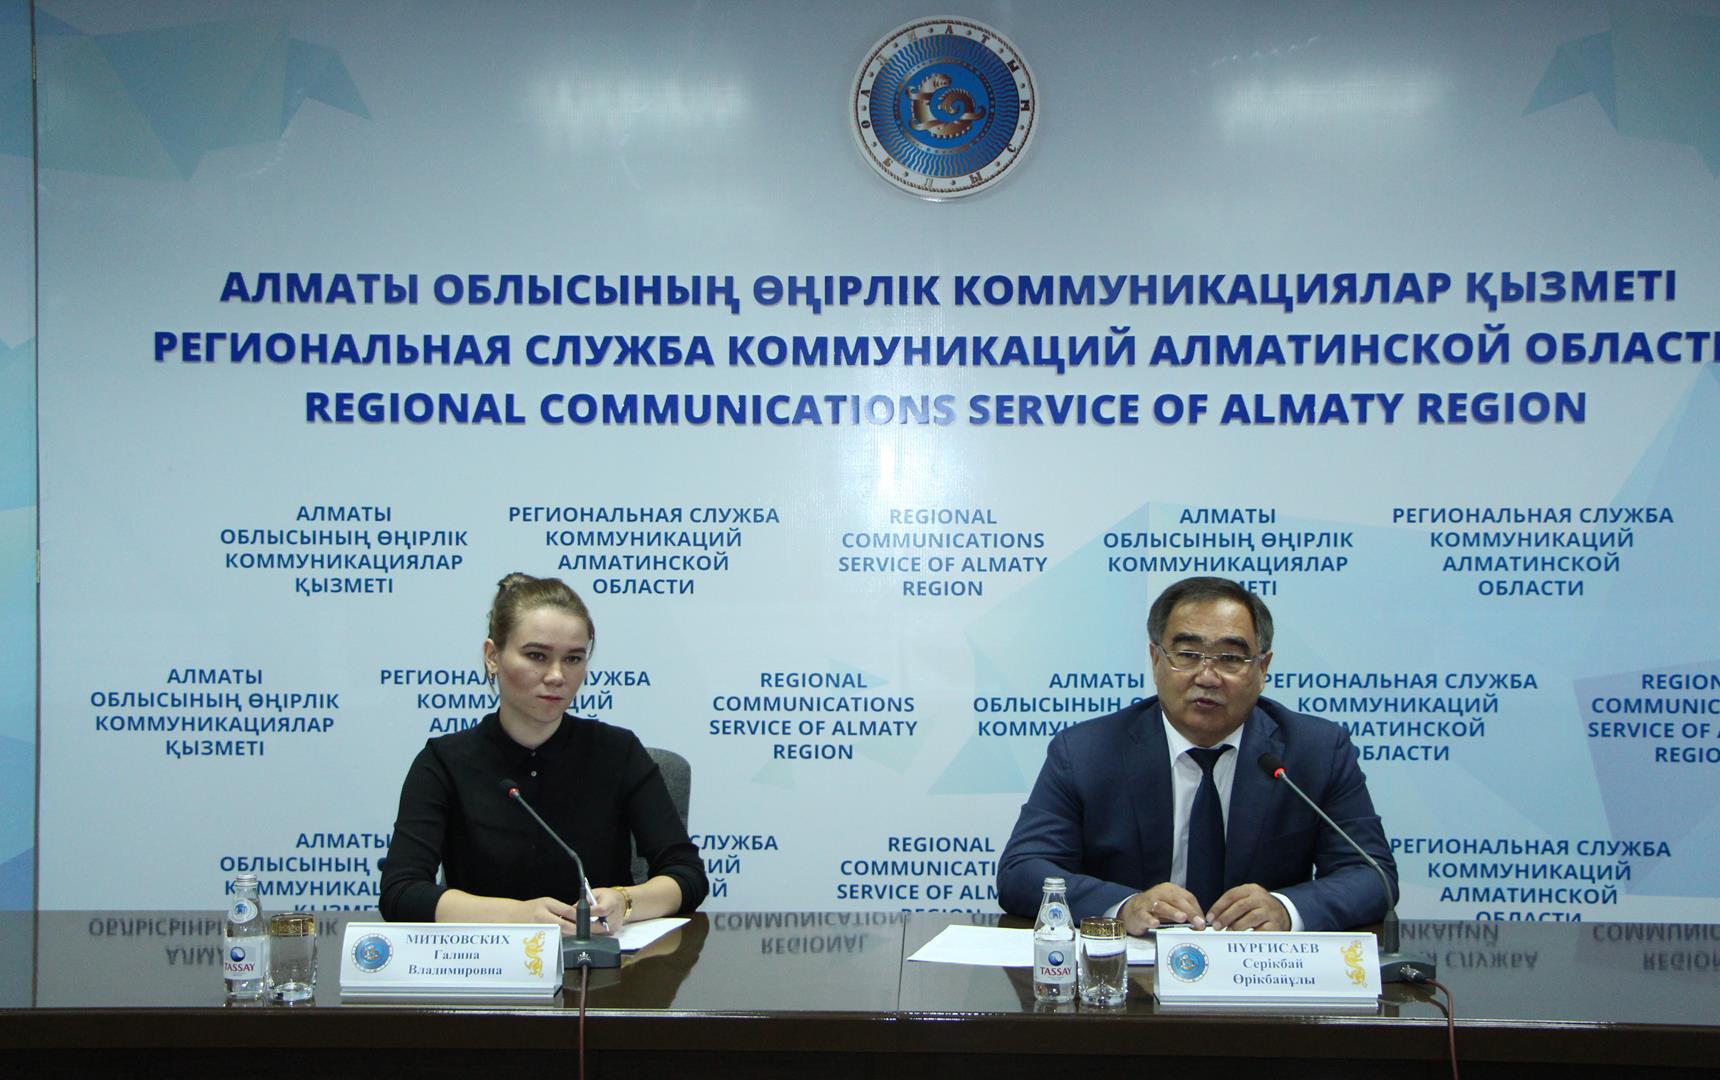 Алматы конкурсы на государственную службу